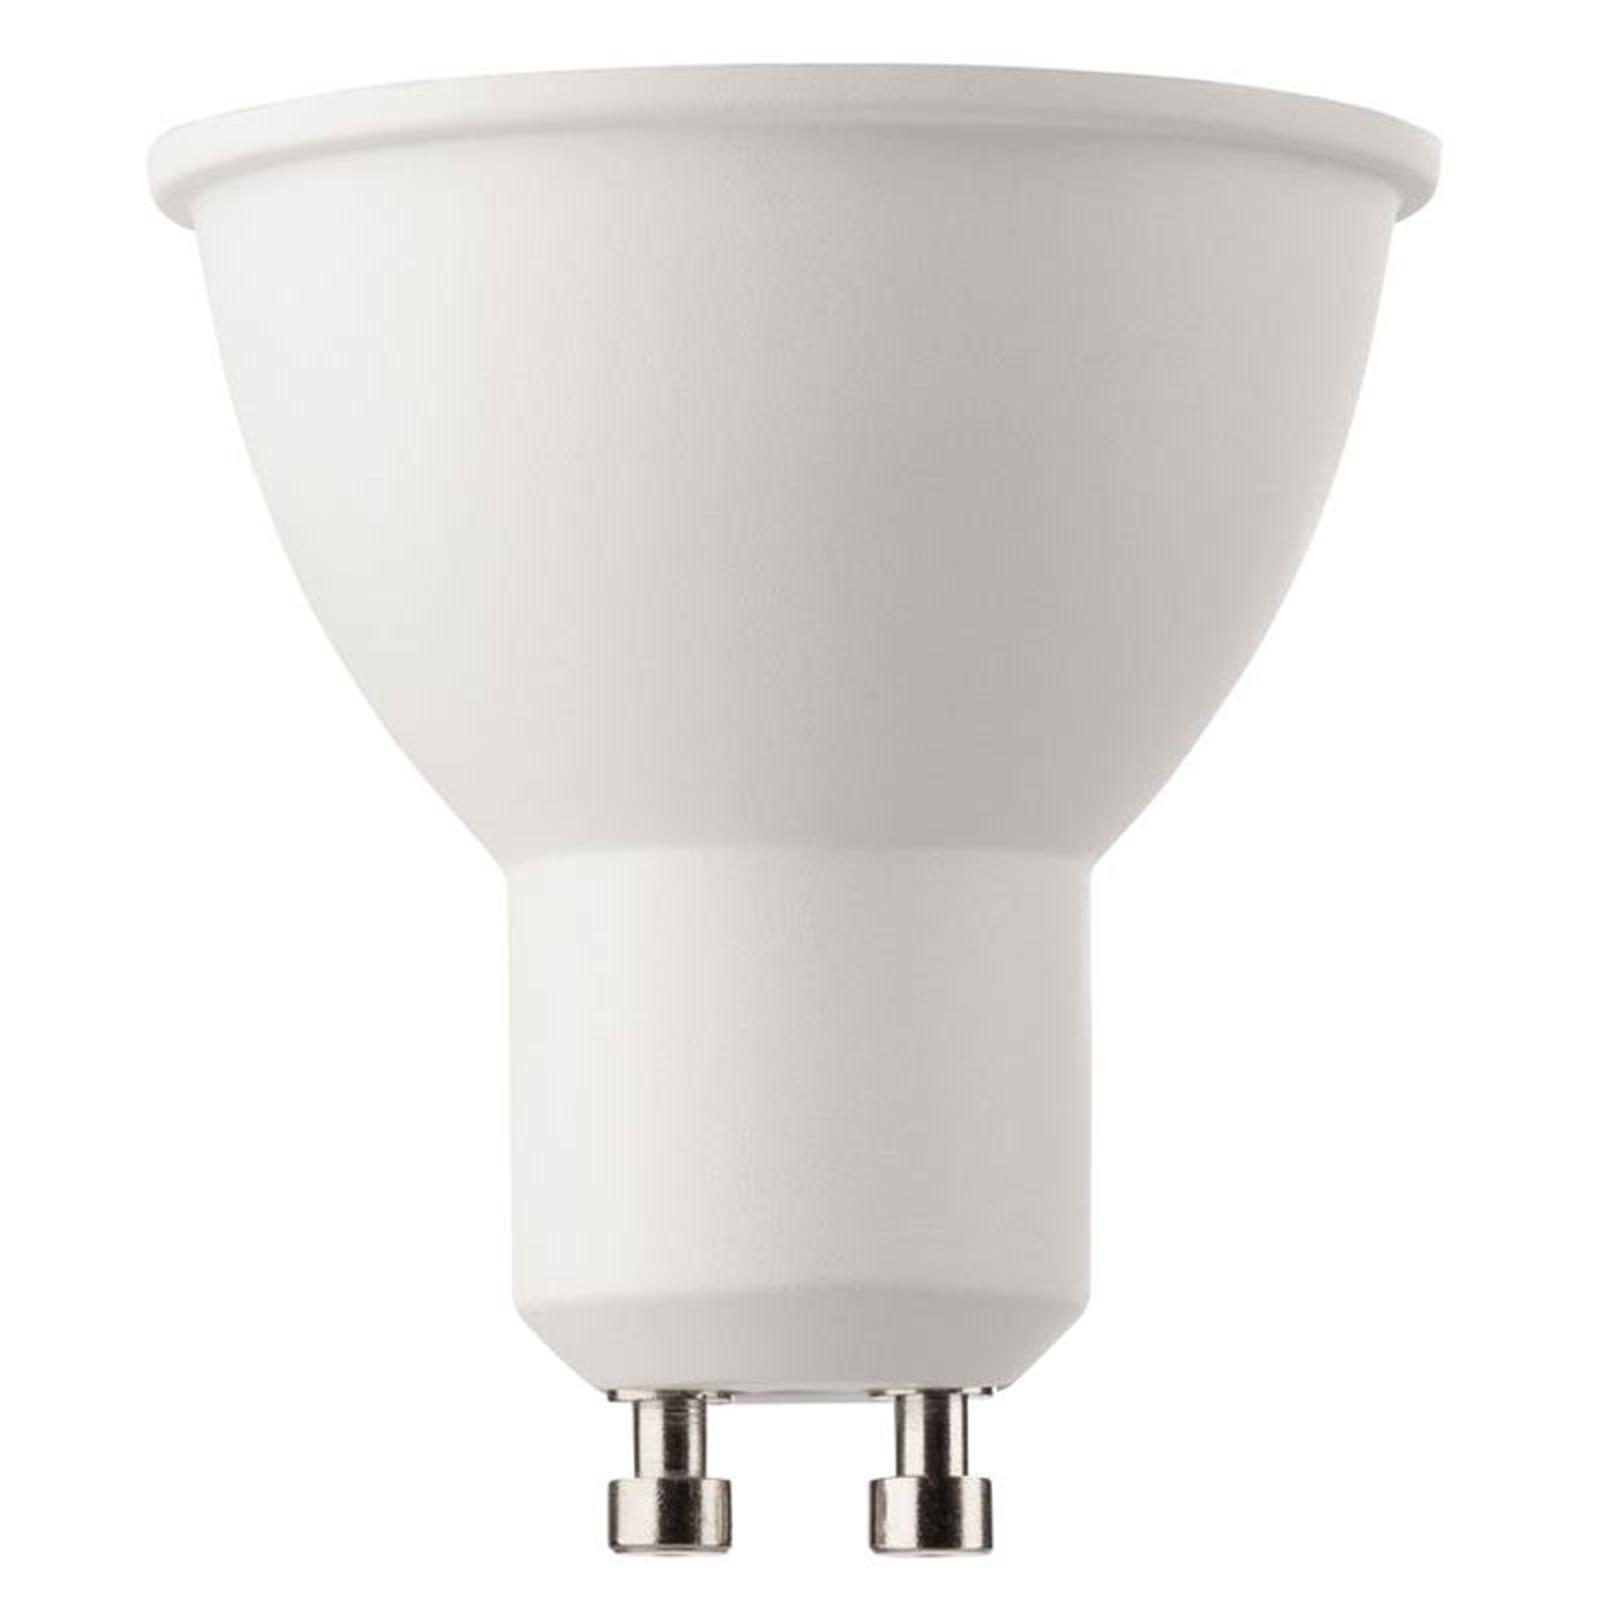 Riflettore LED GU10 6,5 W bianco caldo 380 Lumen